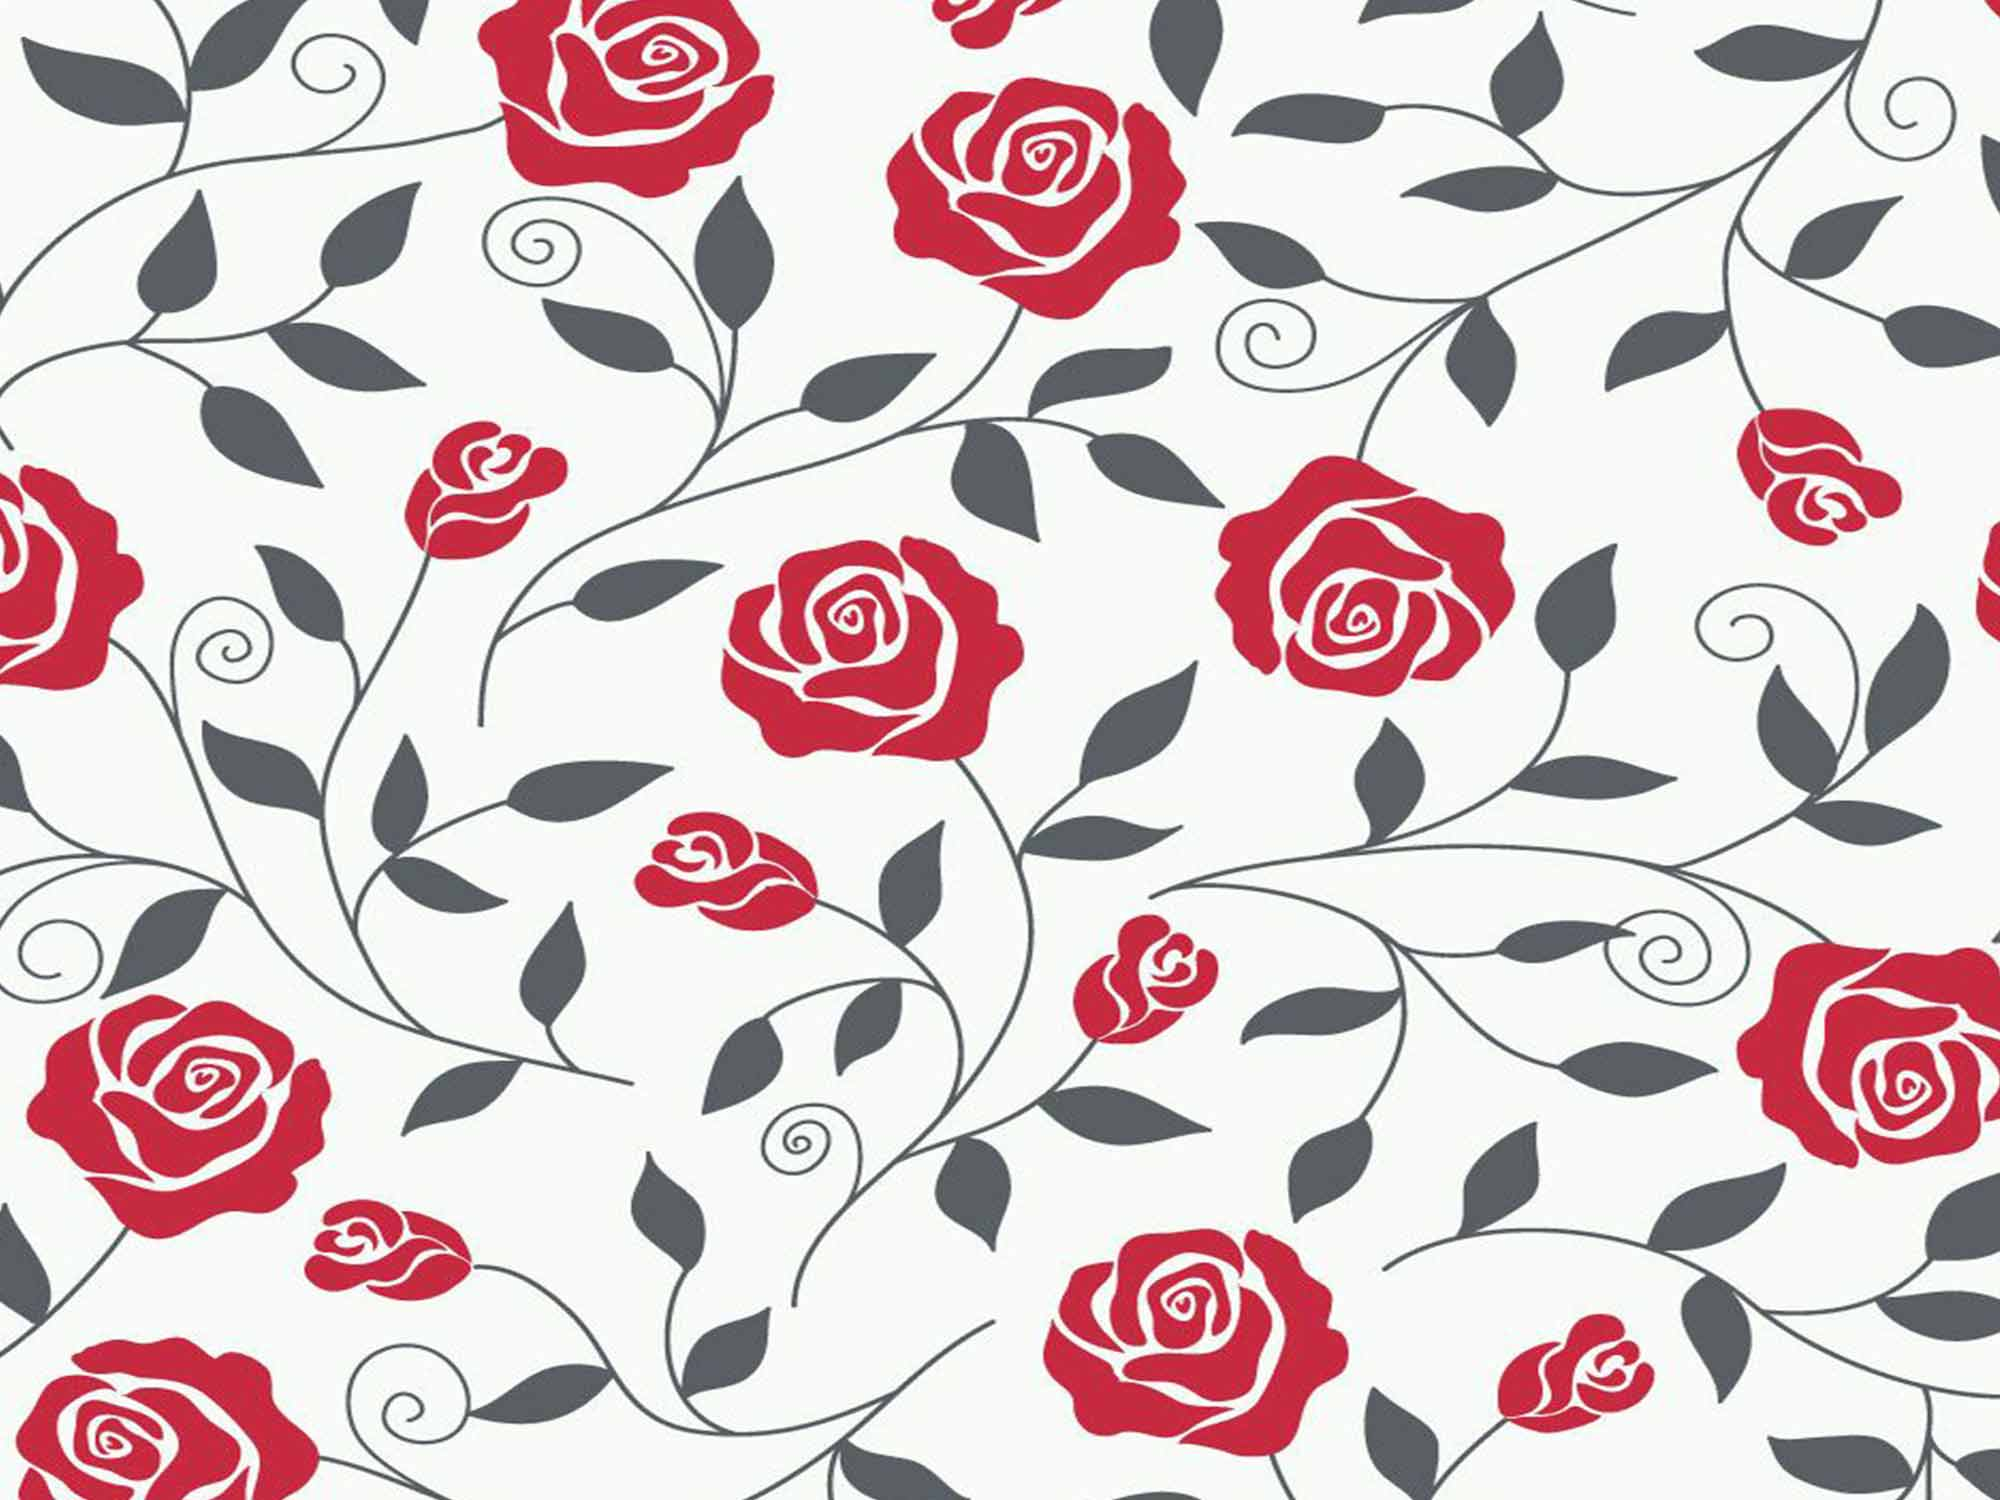 Papel de Parede Floral 0089 - Adesivos de Parede  - Paredes Decoradas